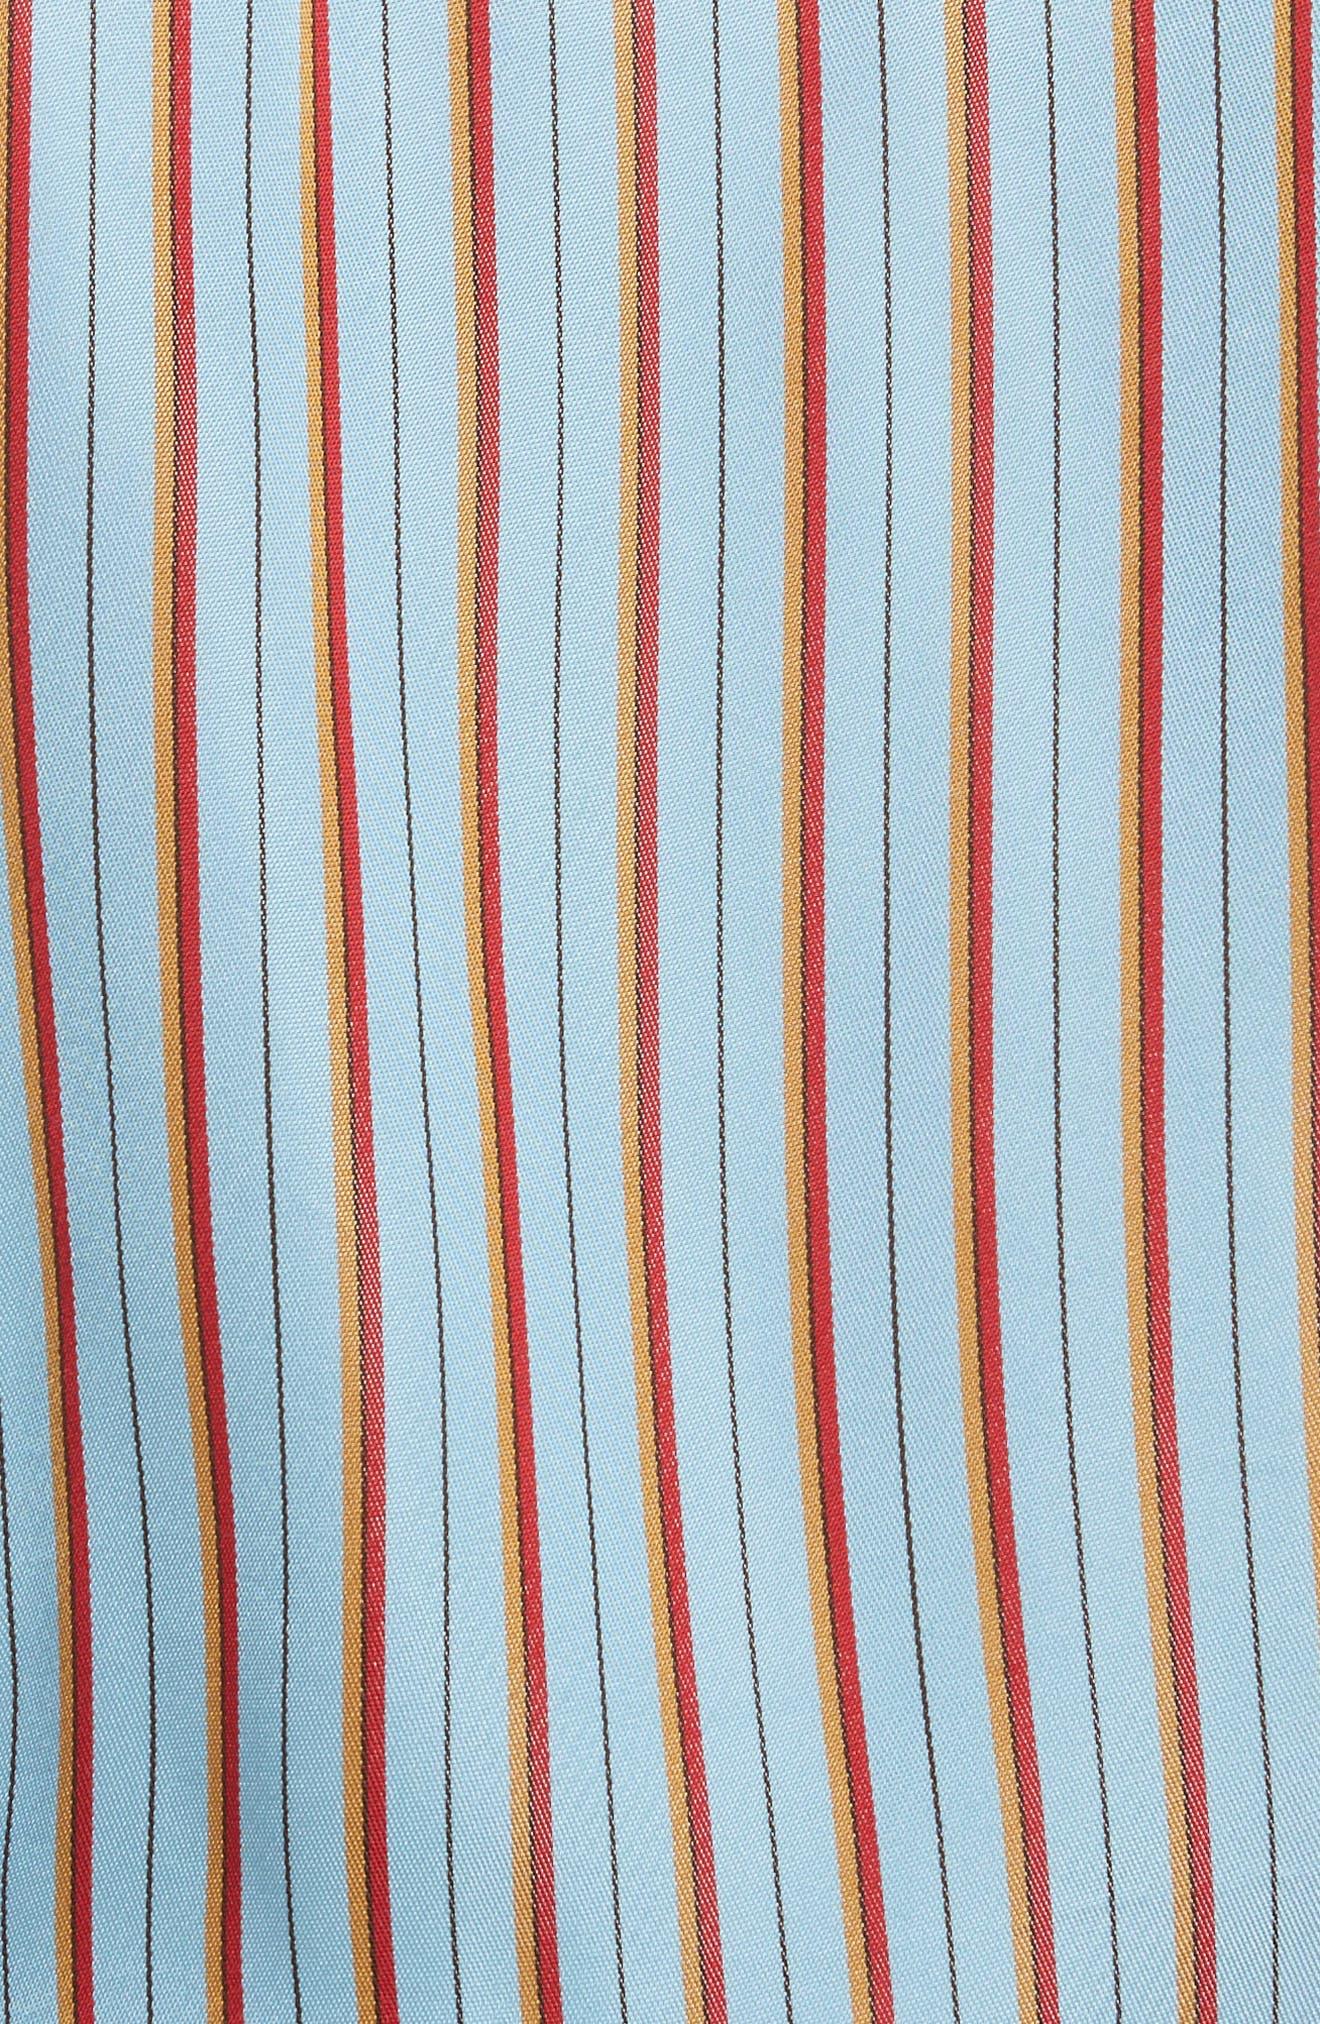 Diane von Furstenberg Stripe Wrap Top,                             Alternate thumbnail 5, color,                             477